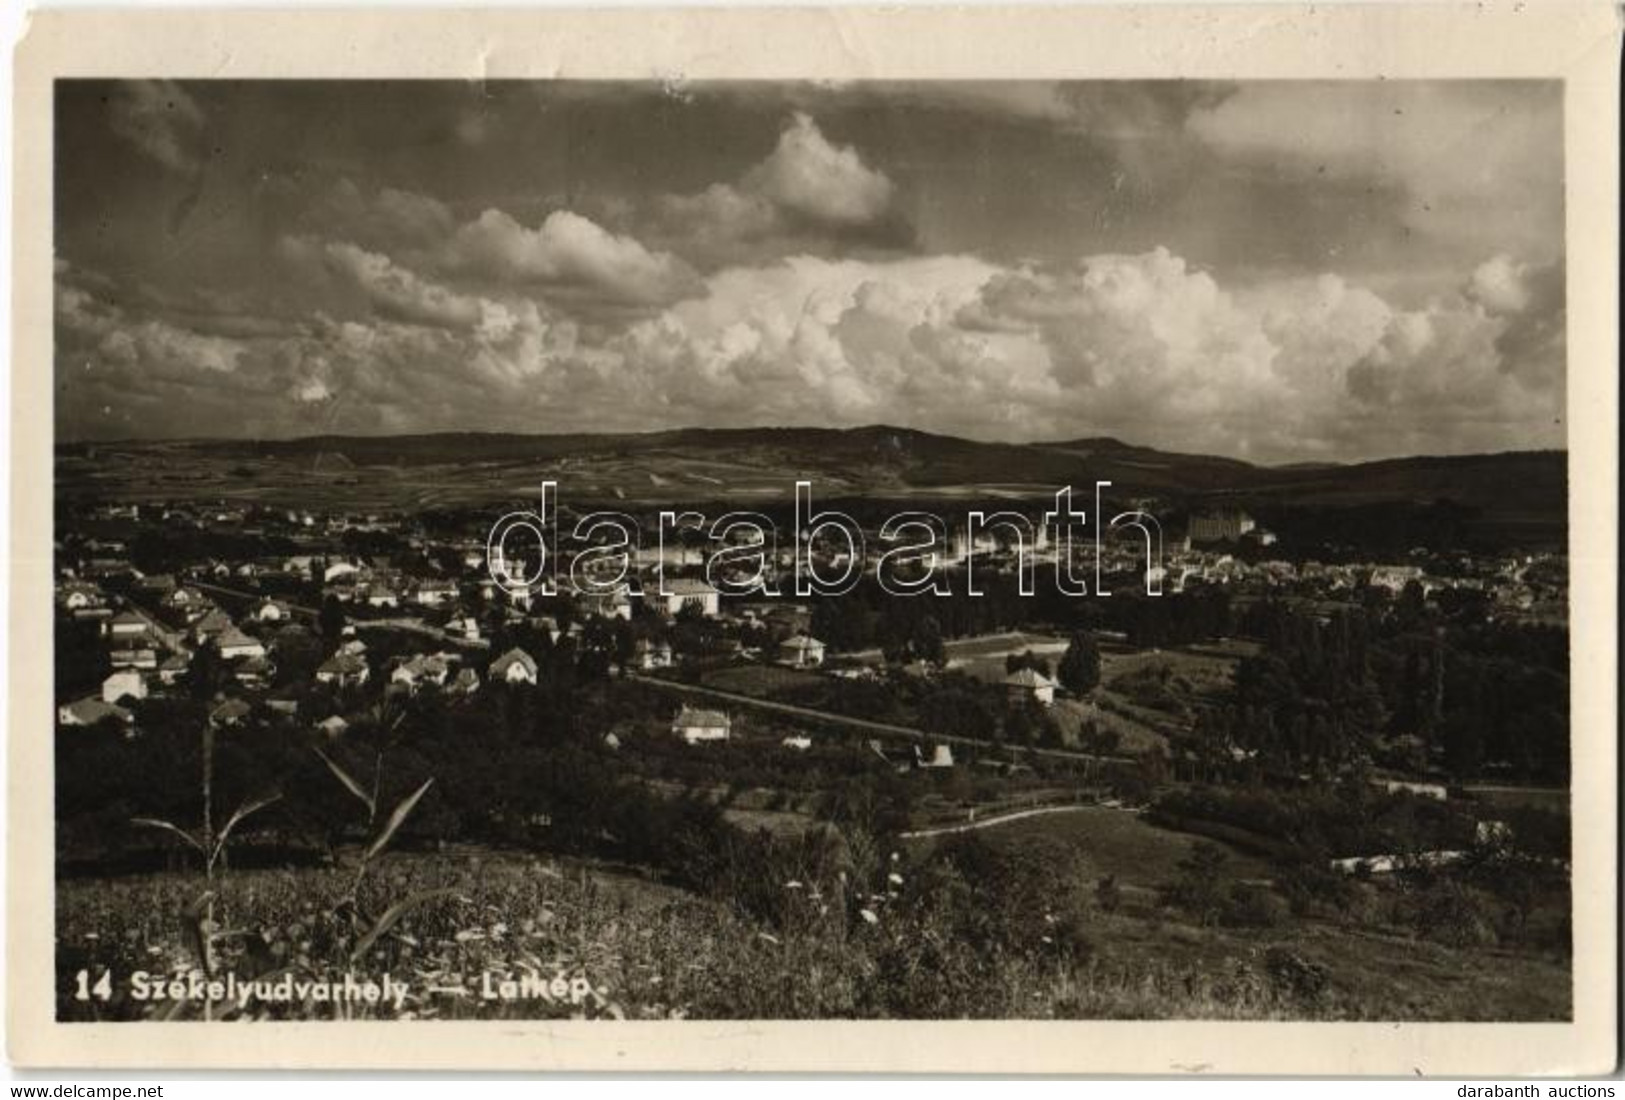 ** T4 Székelyudvarhely, Odorheiu Secuiesc; Látkép / General View (EM) - Unclassified